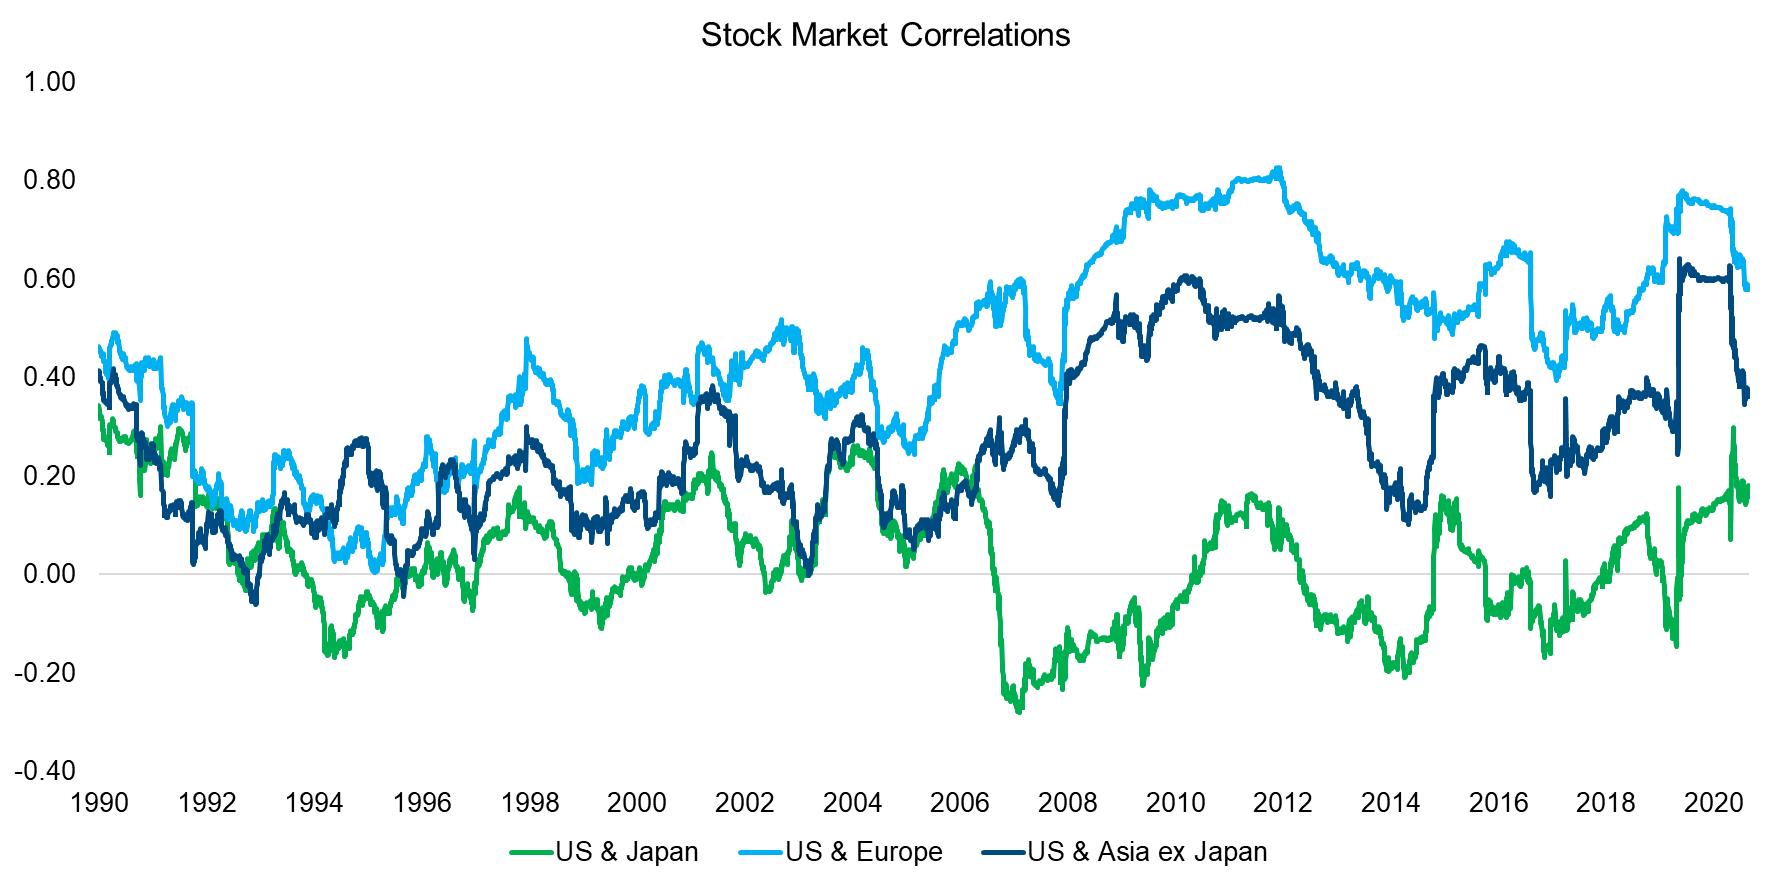 Stock Market Correlations